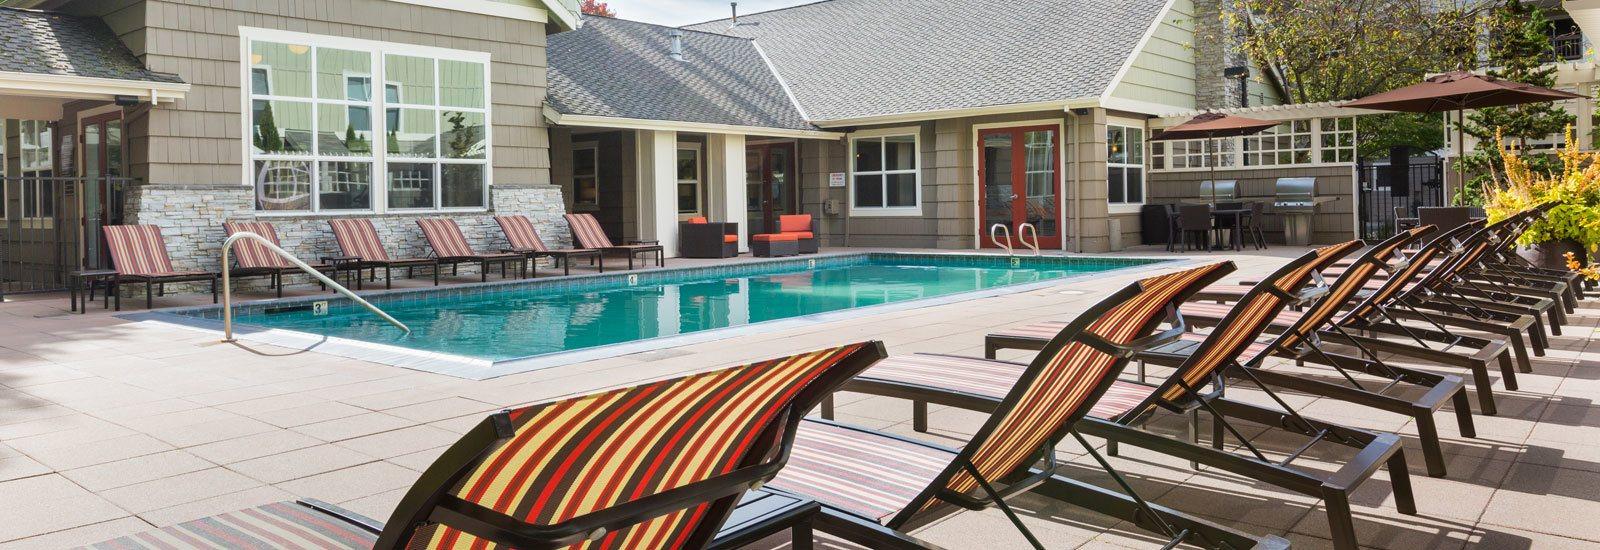 Apartments in Hillsboro OR